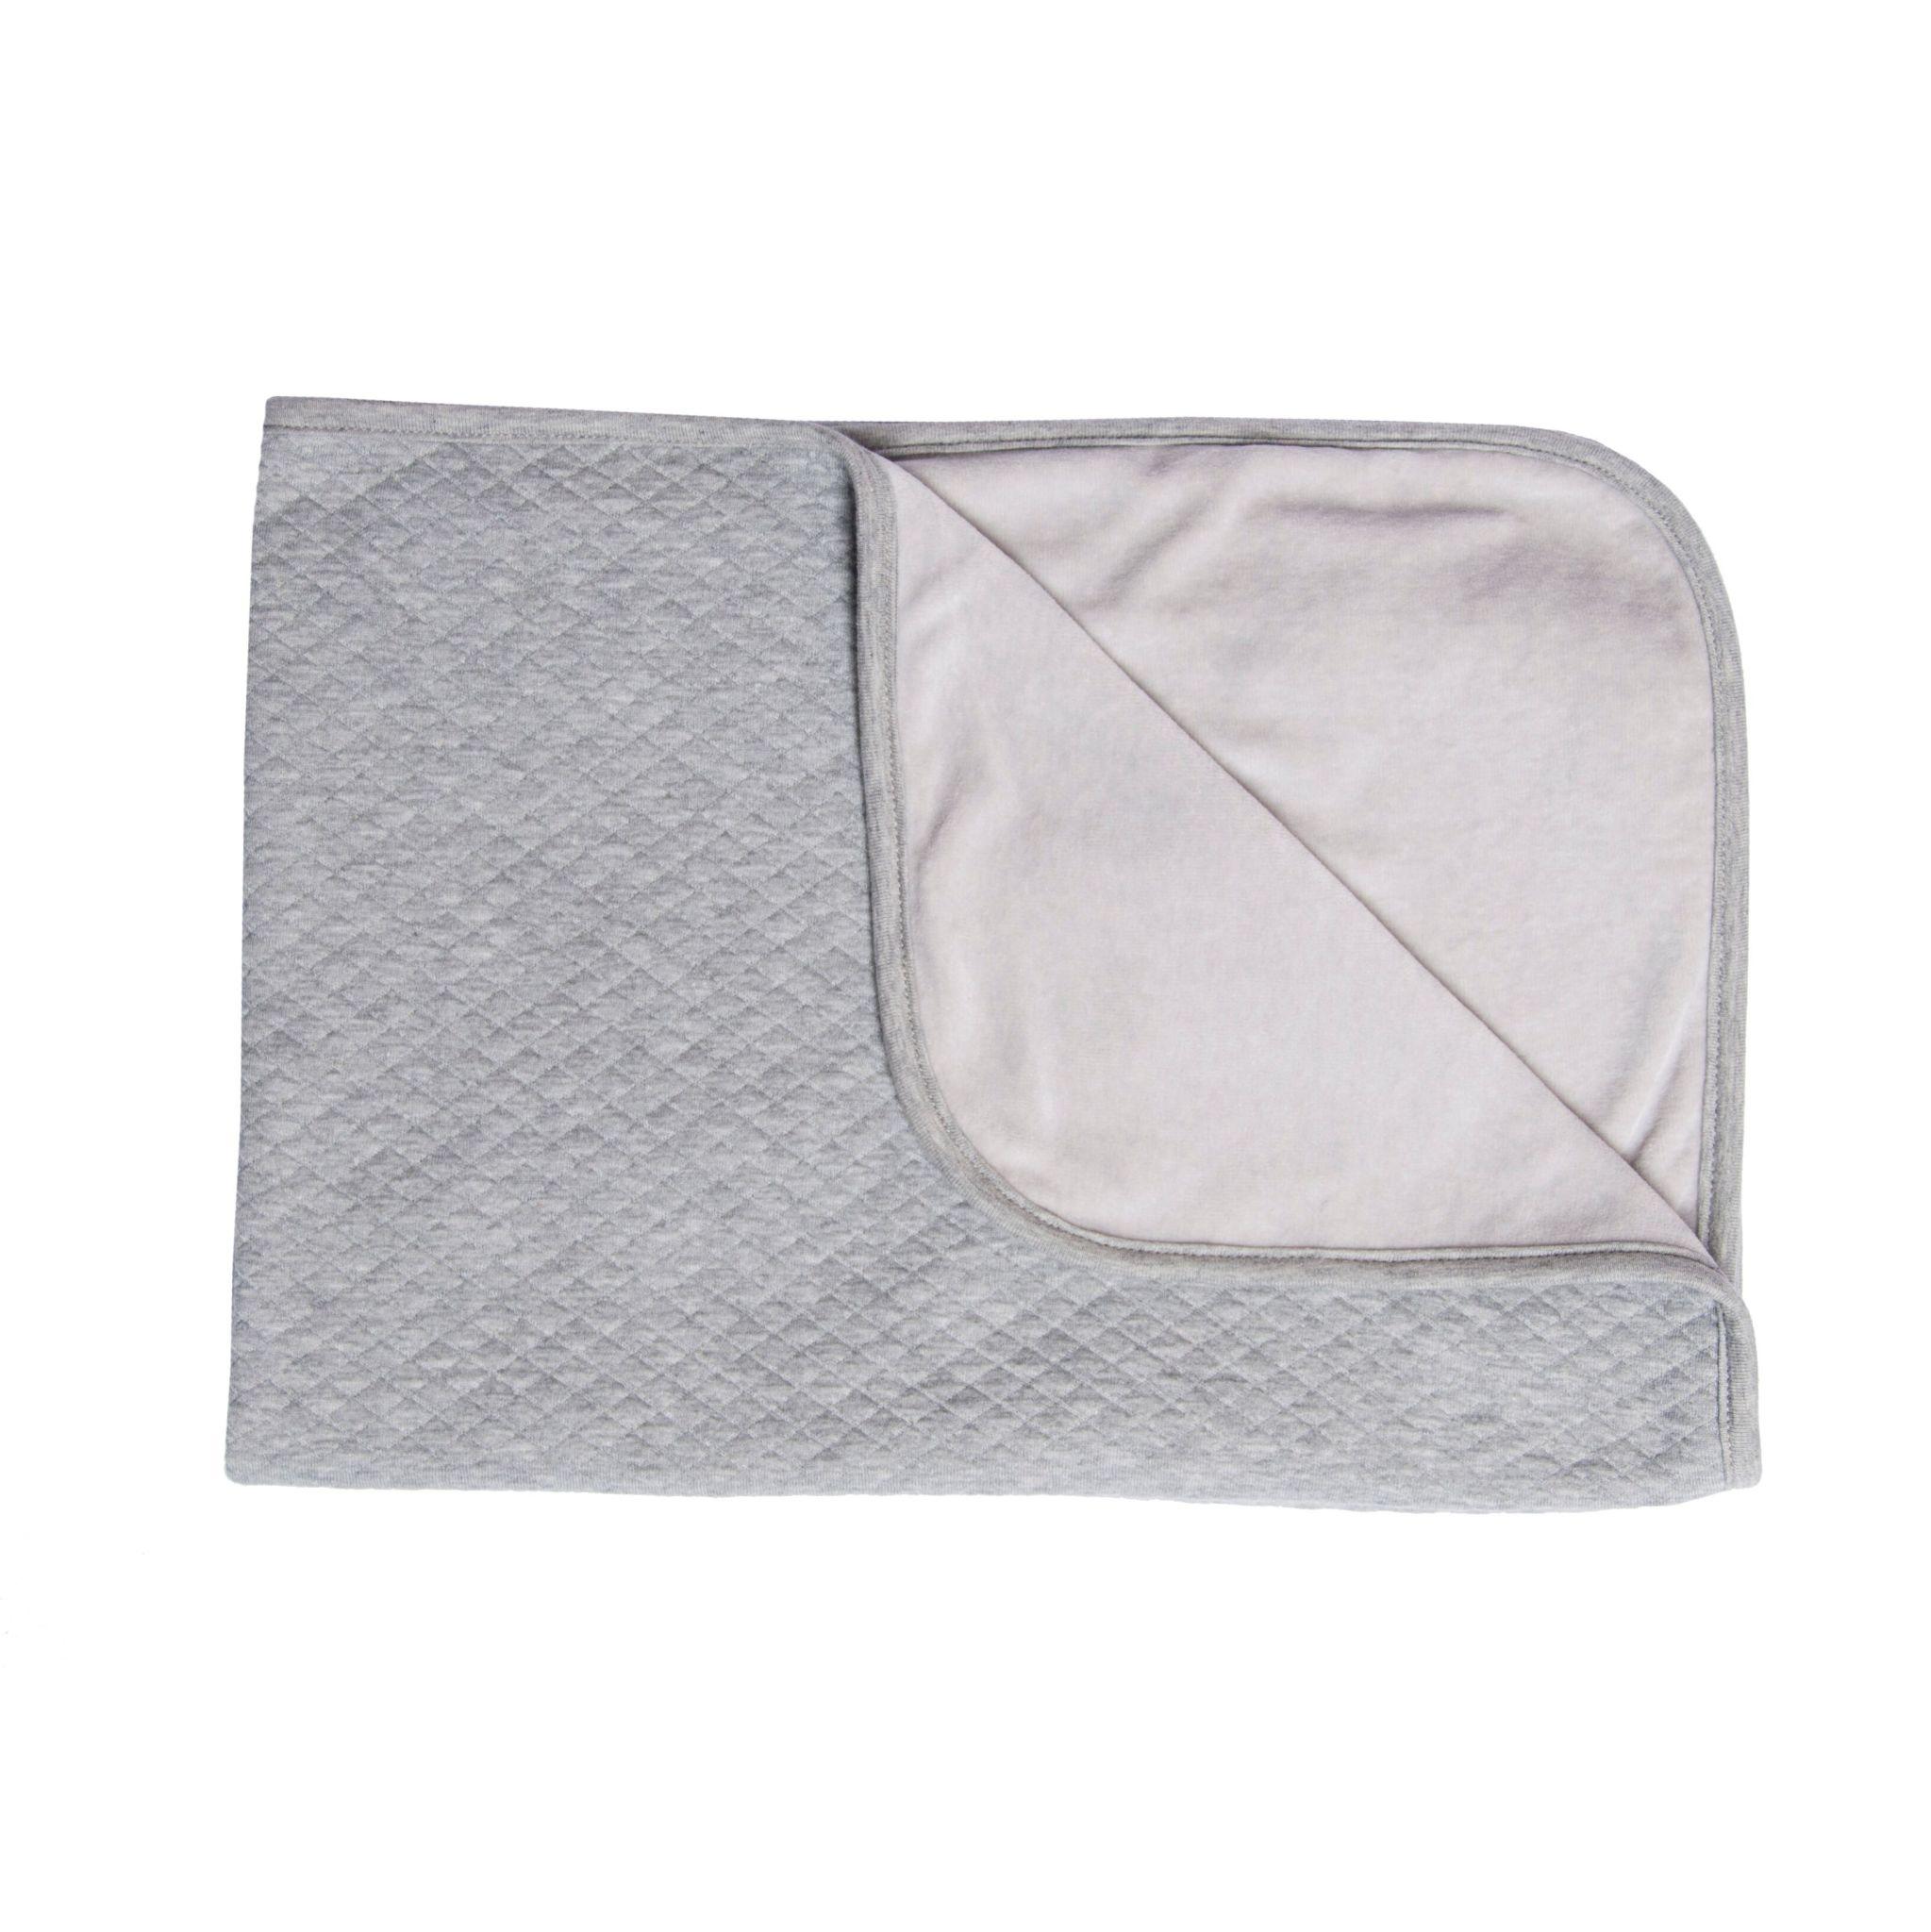 Les Rêves d'Anais Blanket 75x100cm Diamond Stone & Fleece